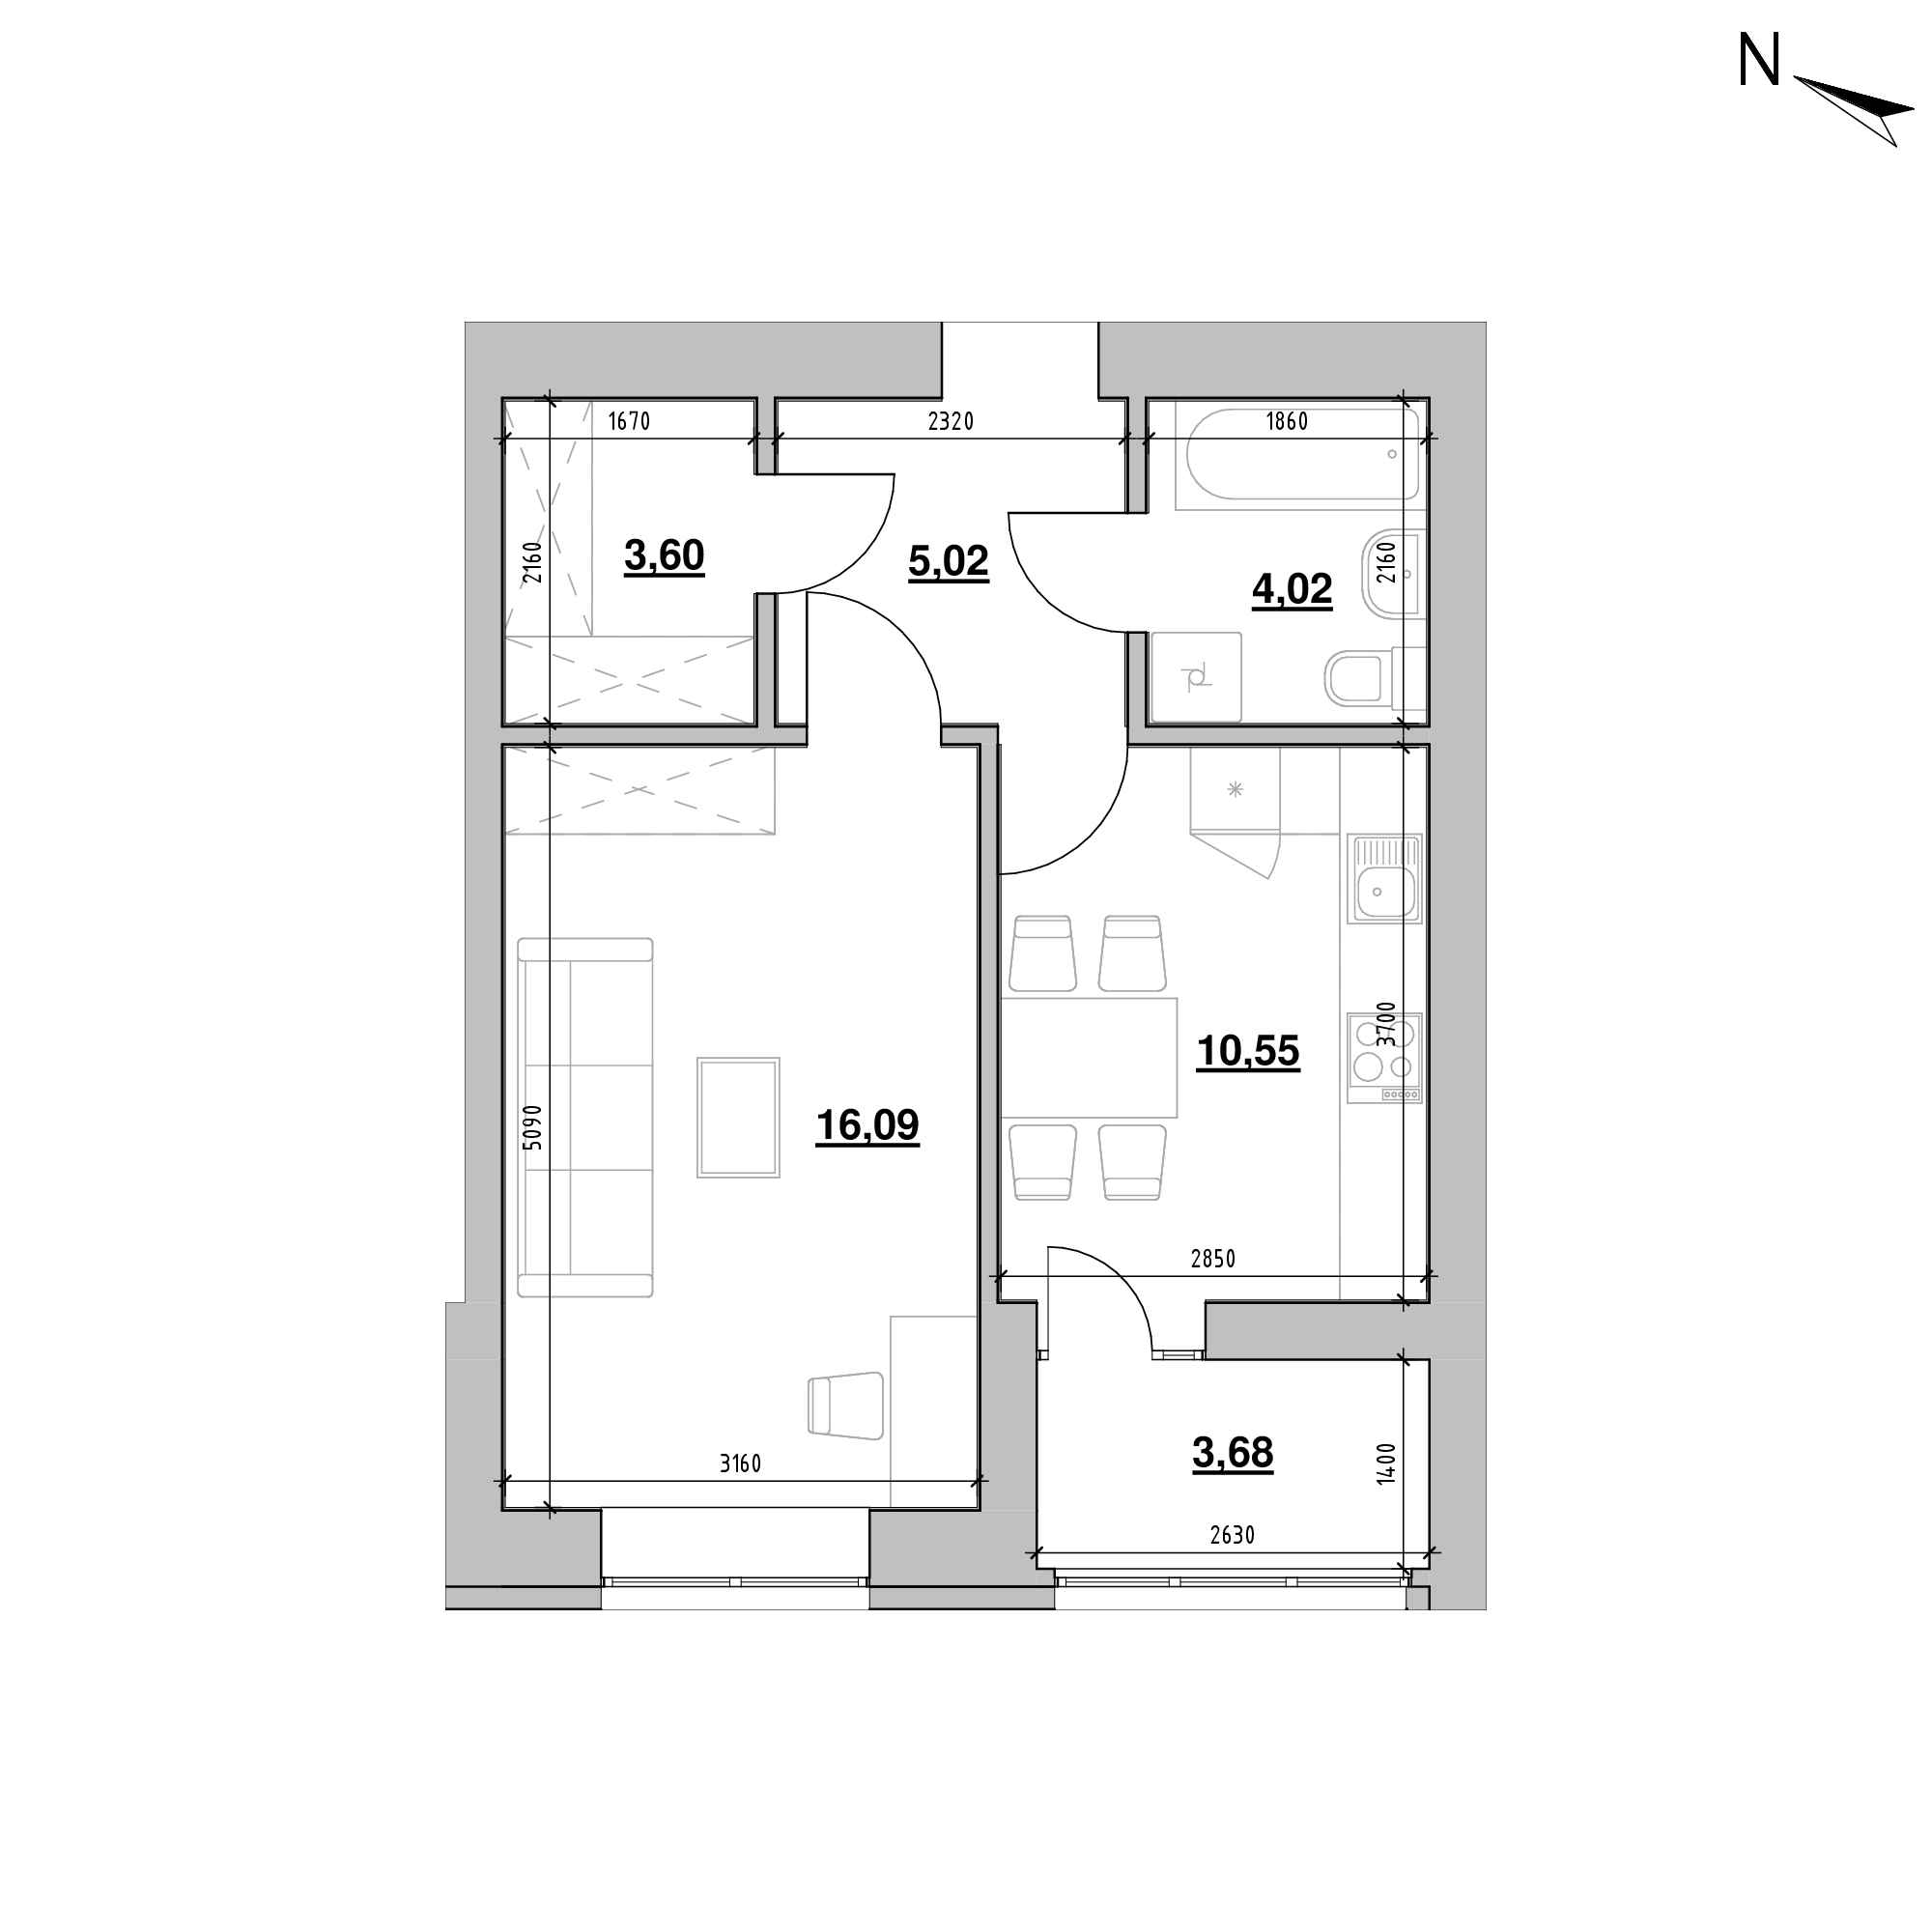 ЖК Шенген: планування 1-кімнатної квартири, №59, 42.96 м<sup>2</sup>